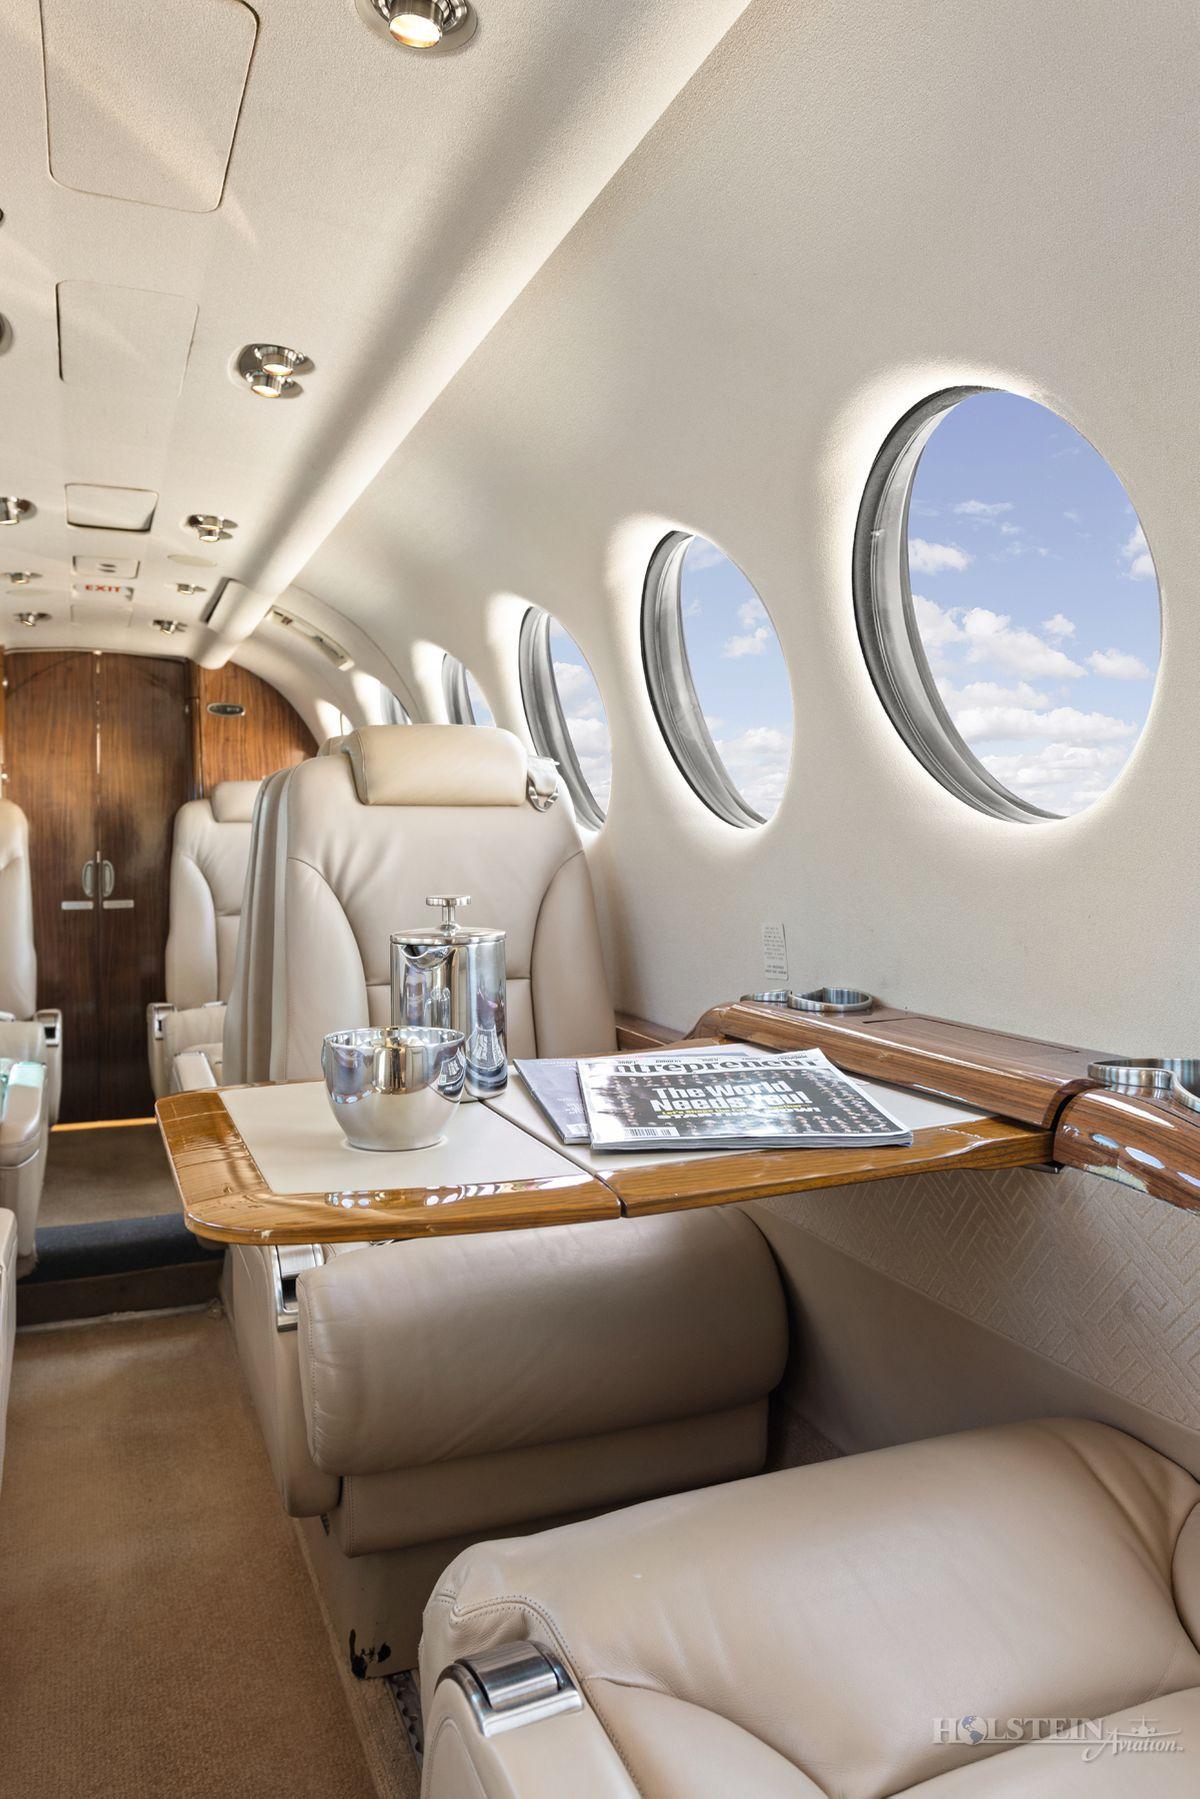 2012 King Air 350i - FL-822 -  N935JC - Int - Seat CU w-tbl ext RGB.jpg